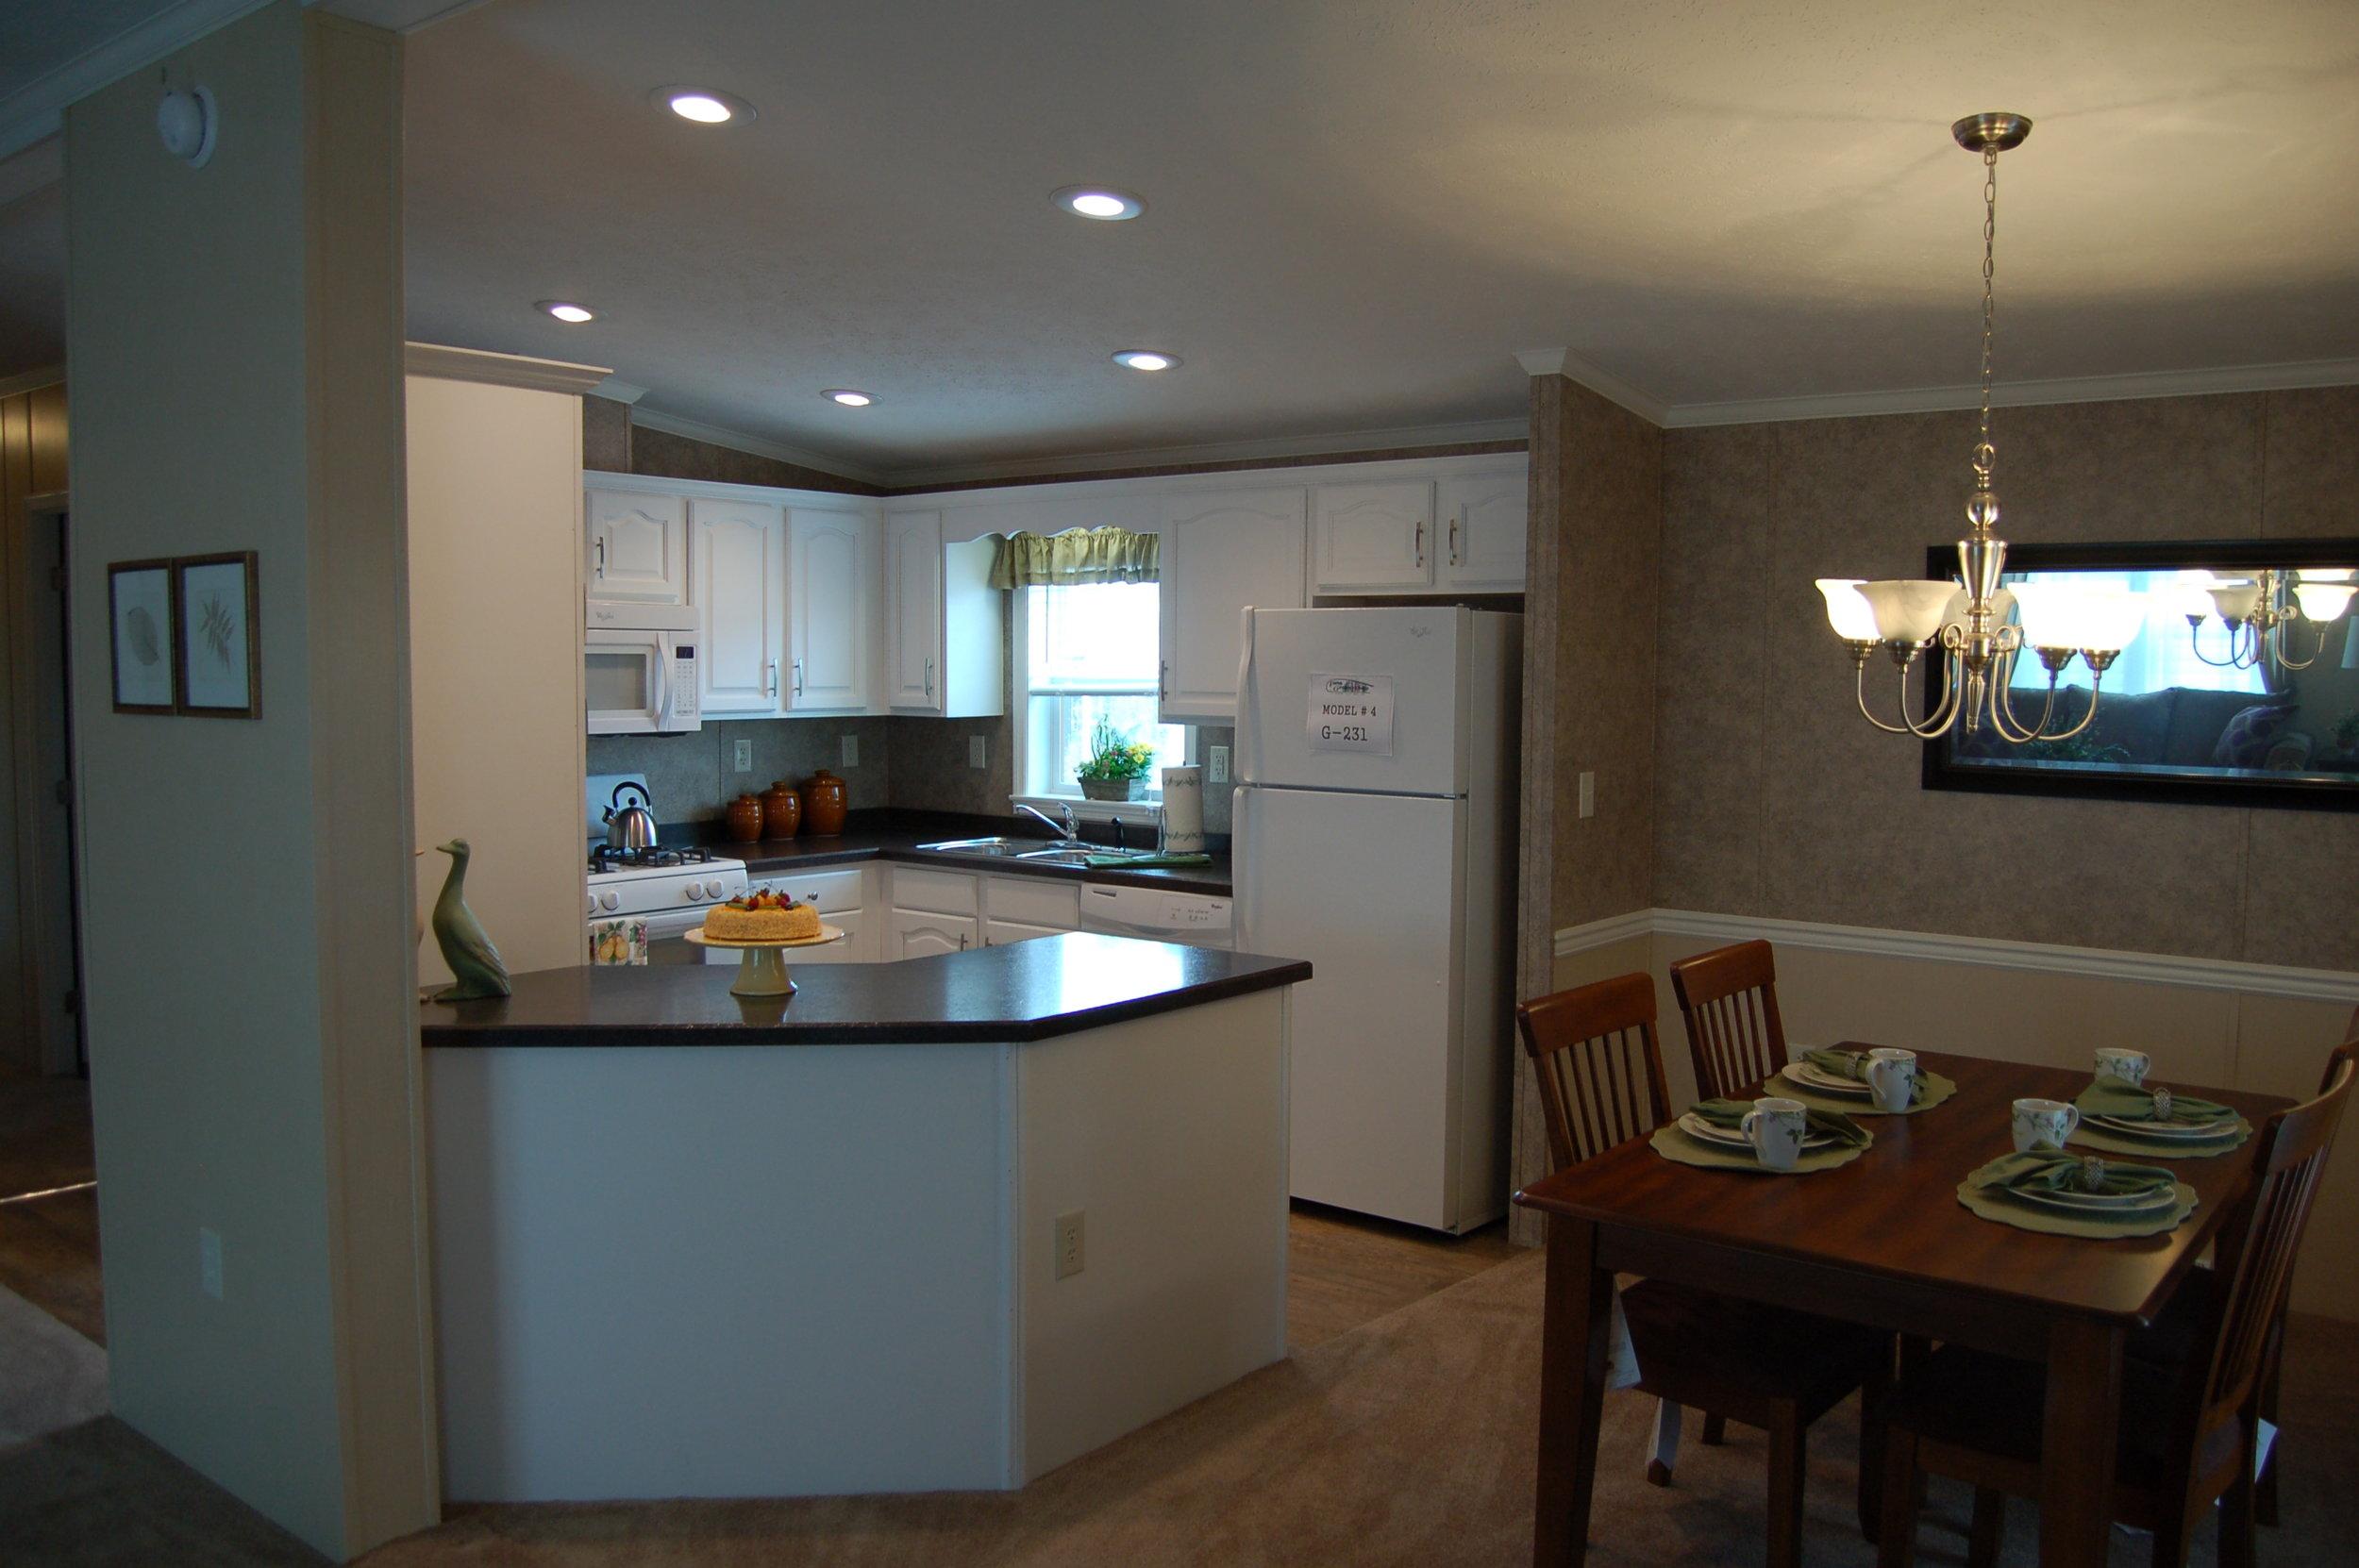 G-231 Dining Room Kitchen.JPG